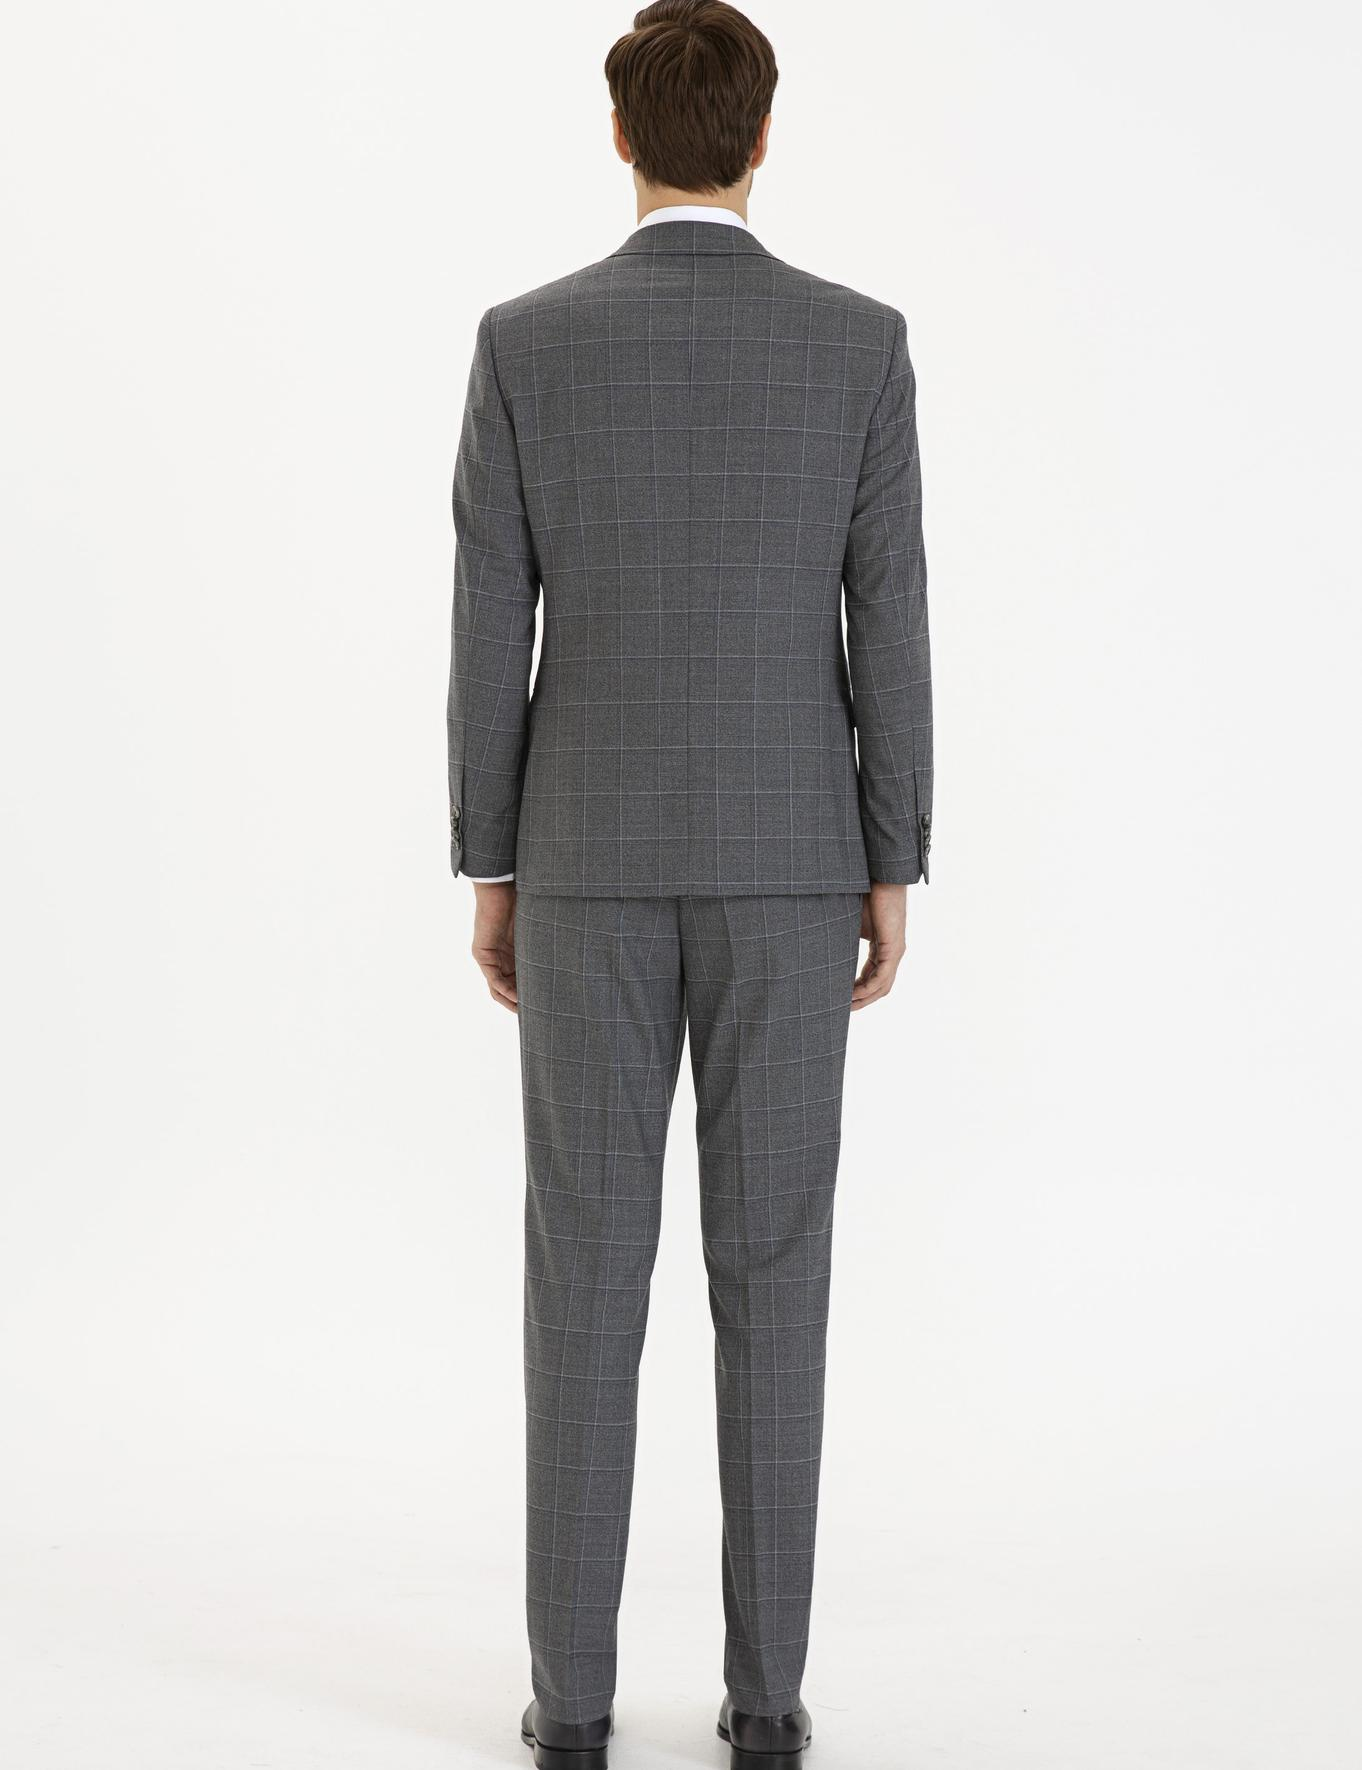 Antrasit Slim Fit Takım Elbise - 50206943023